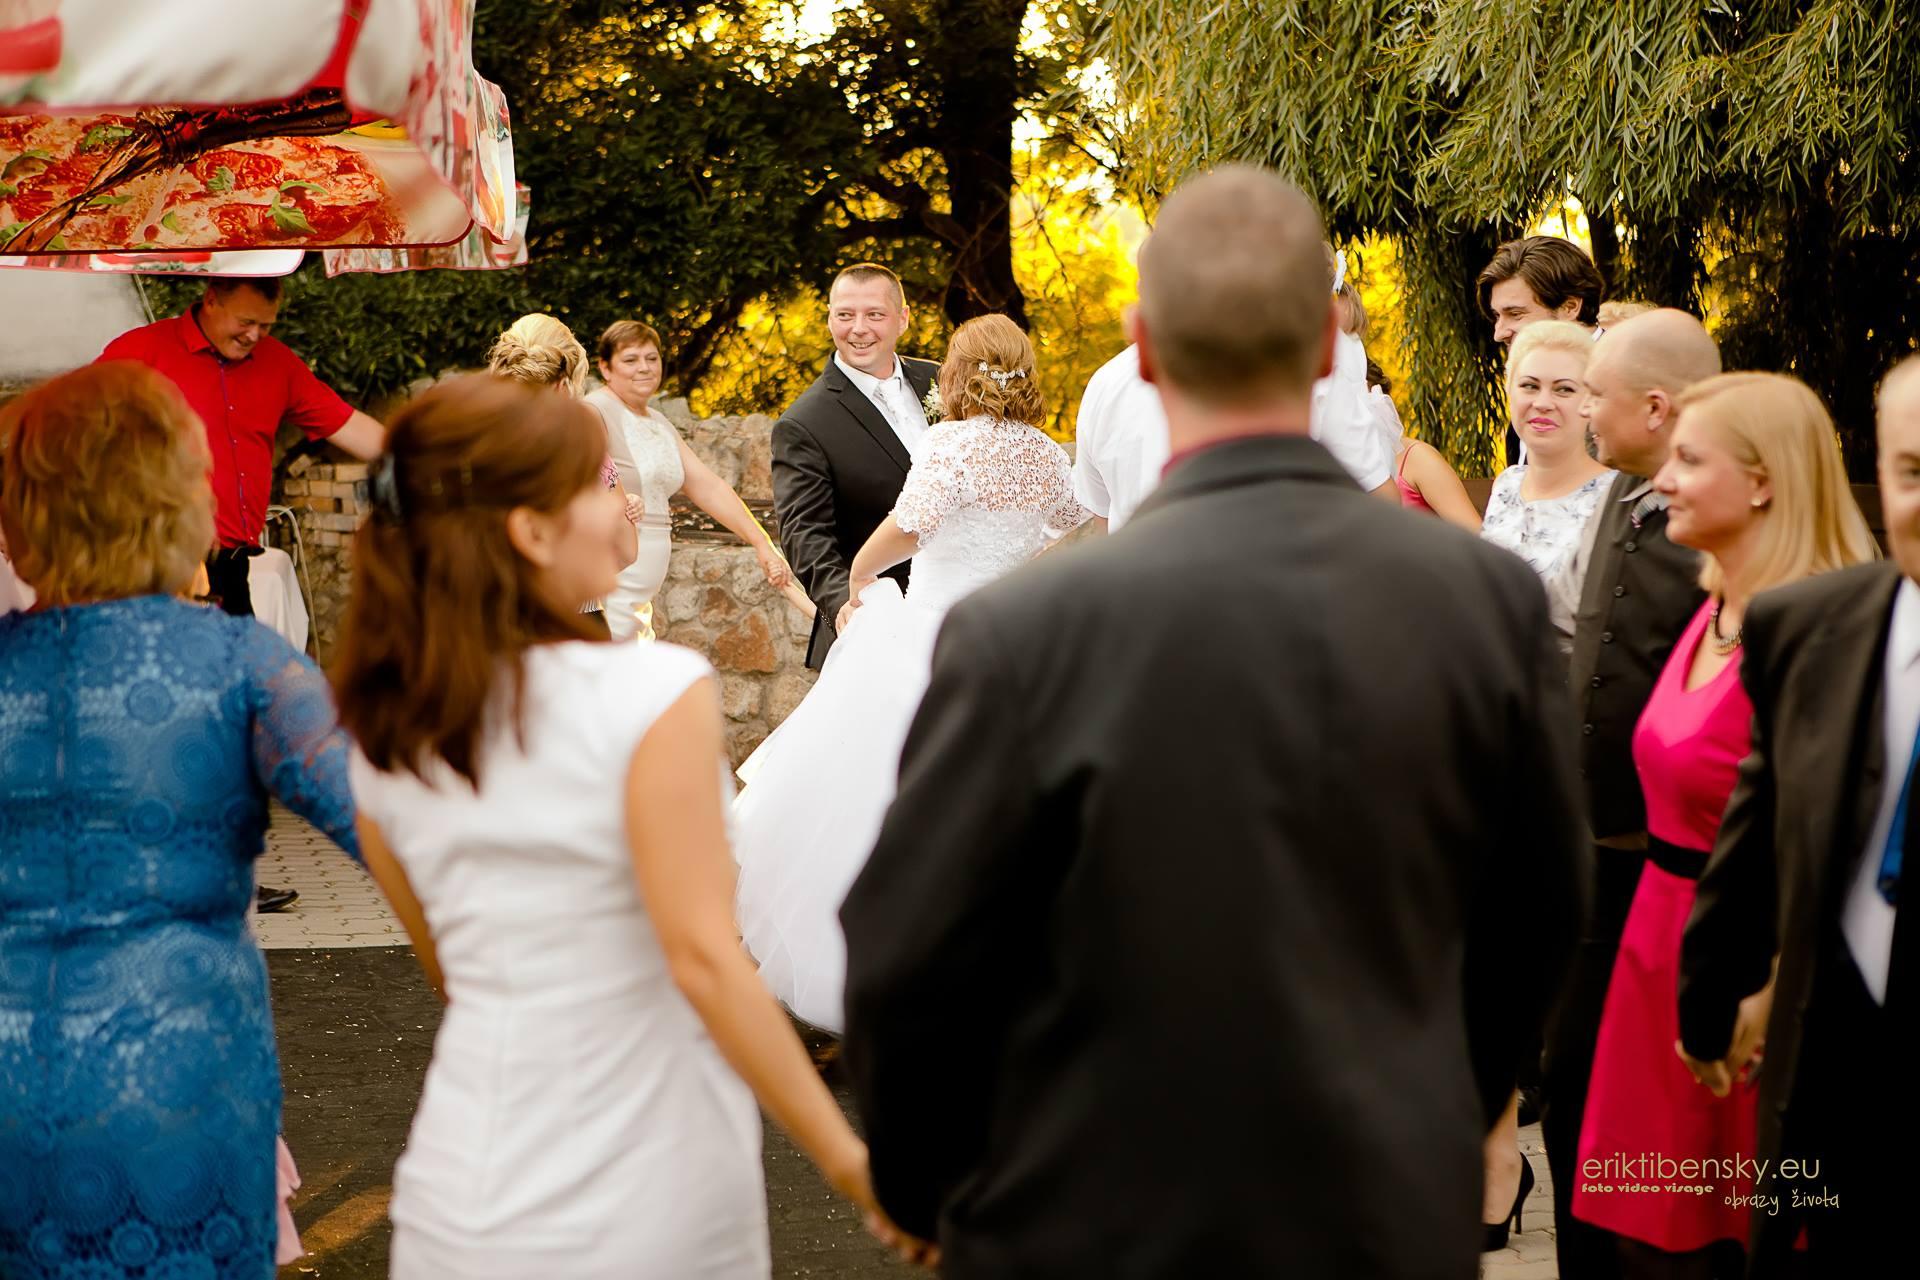 eriktibensky-eu-svadobny-fotograf-wedding-photographer-3045